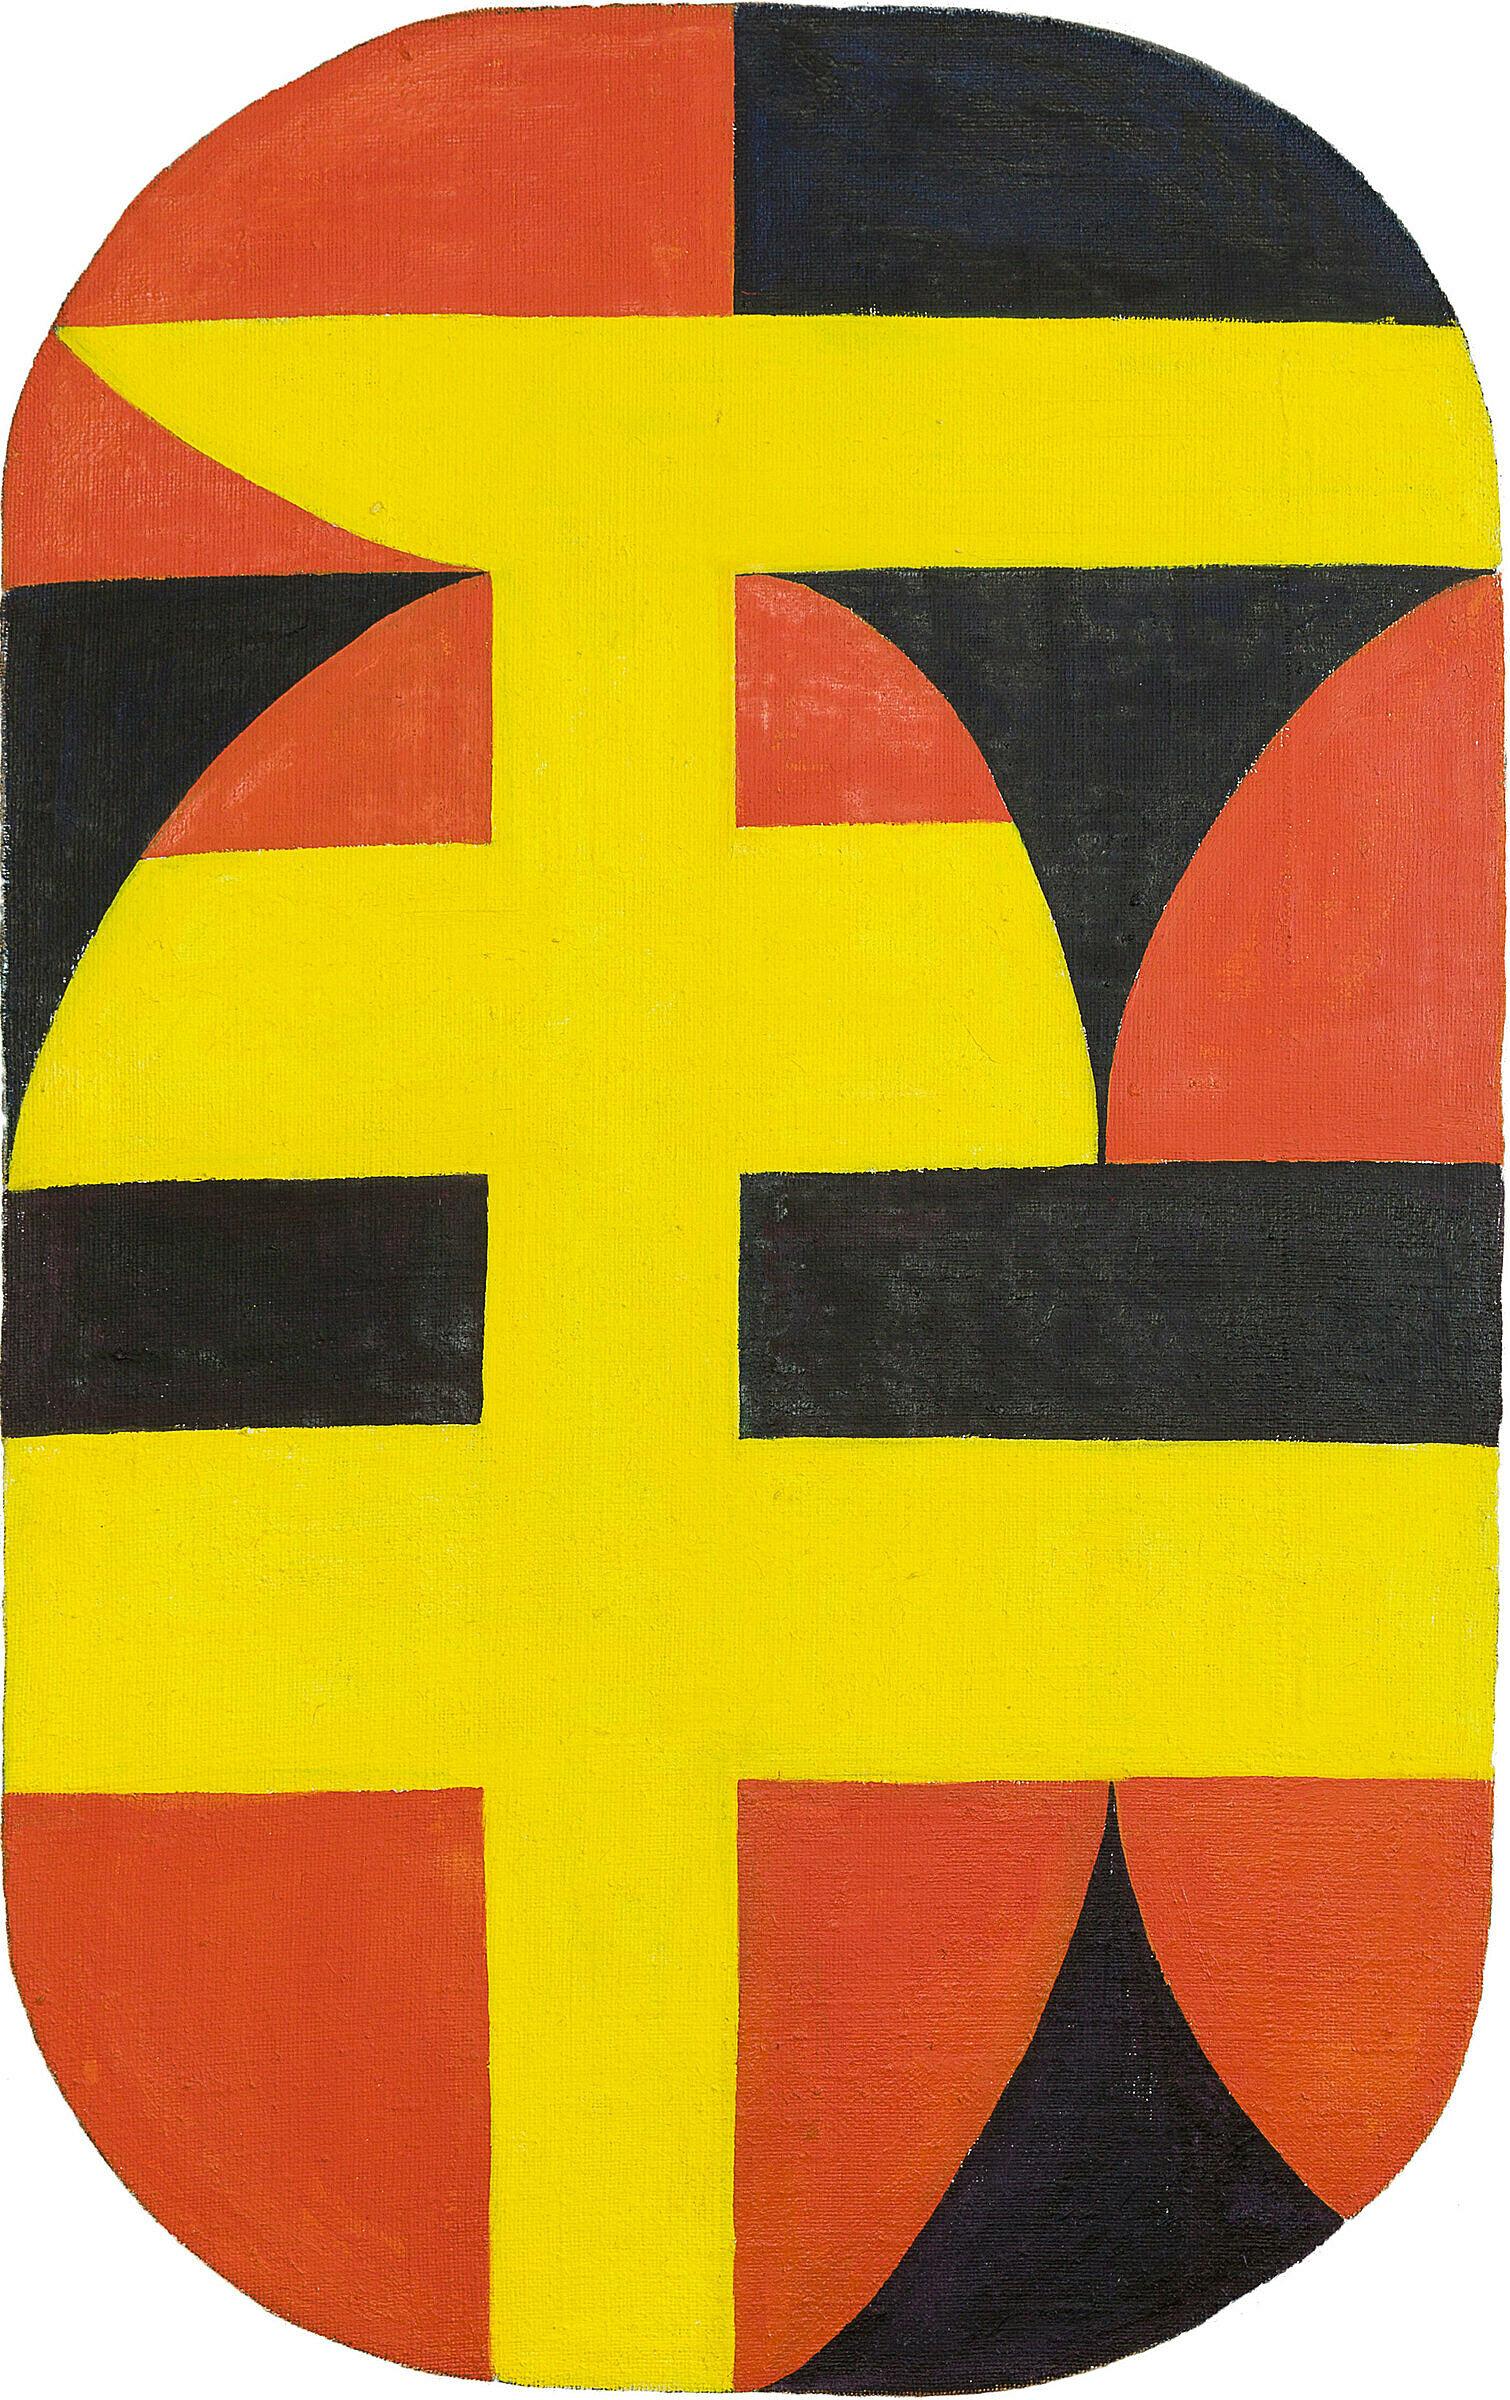 A yellow, orange and black artwork by Carmen Herrera.